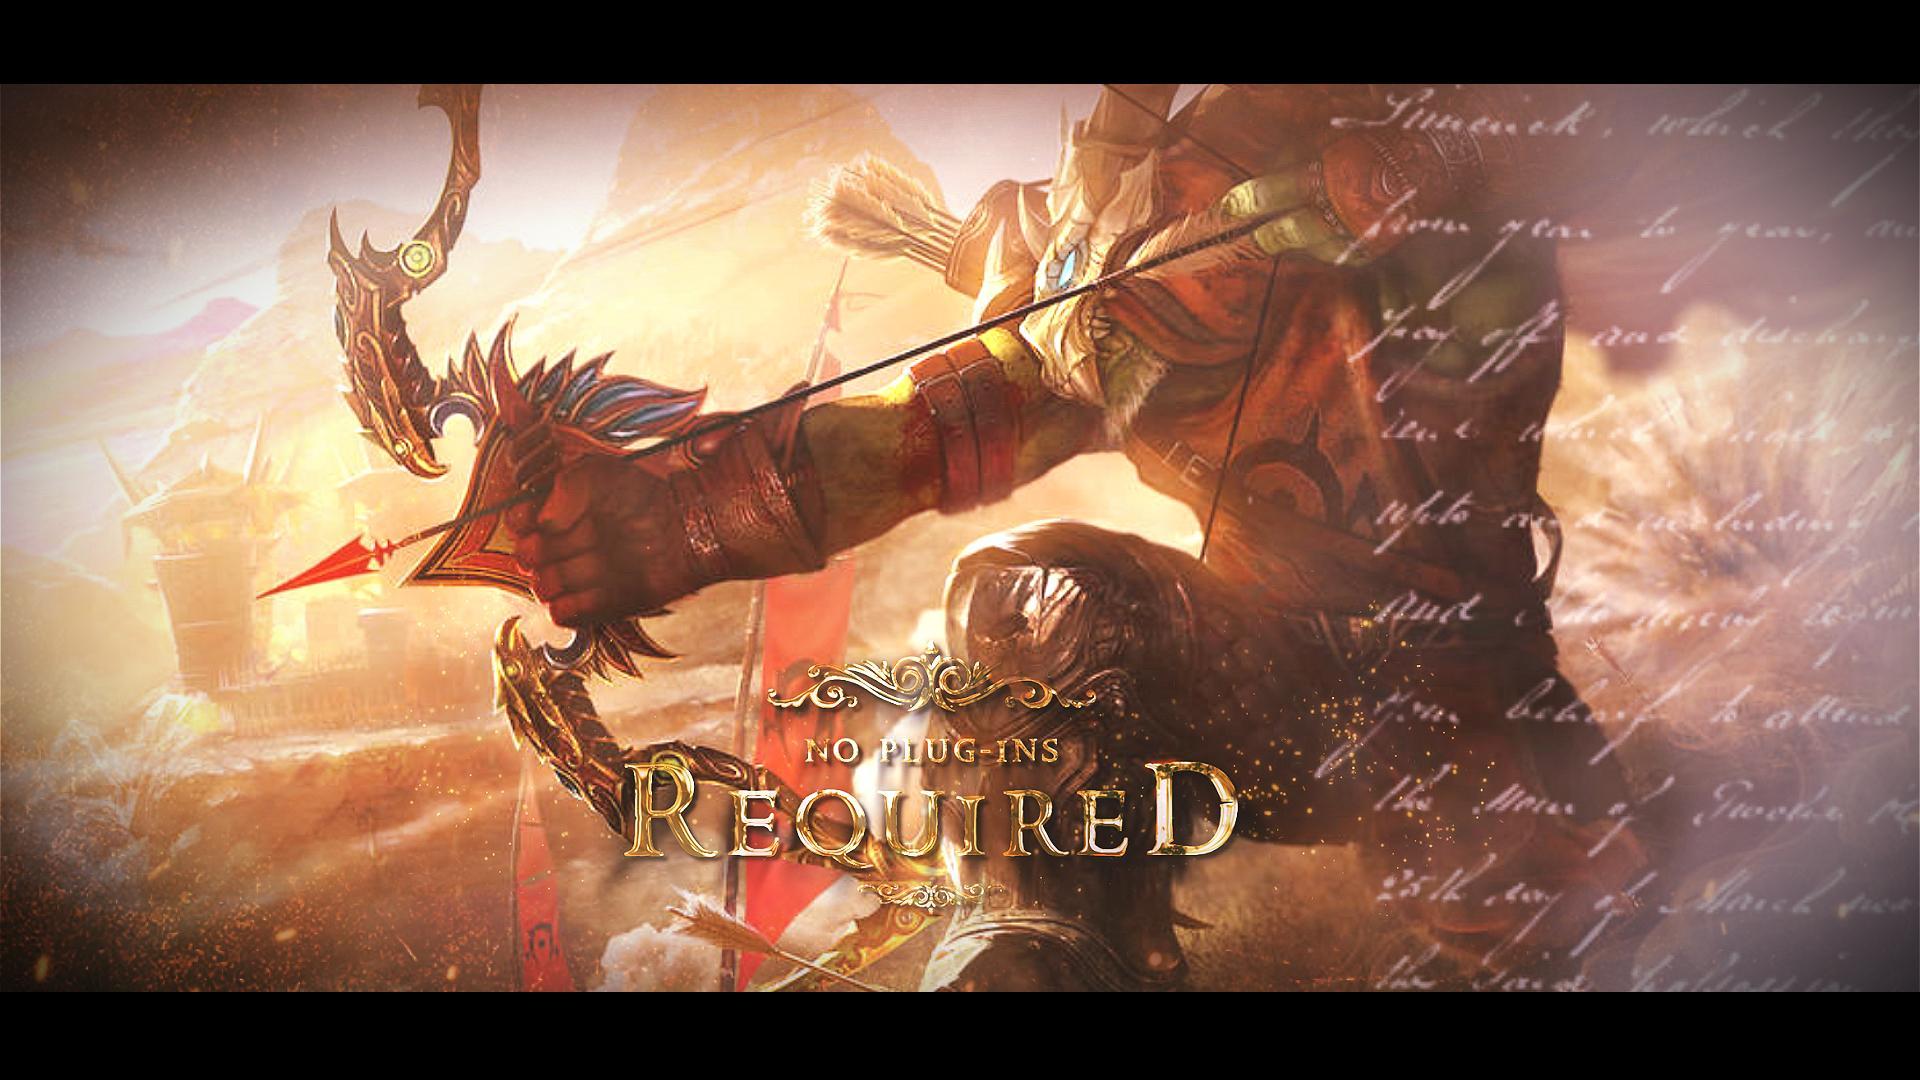 Archangel - Epic Fantasy Trailer - 7